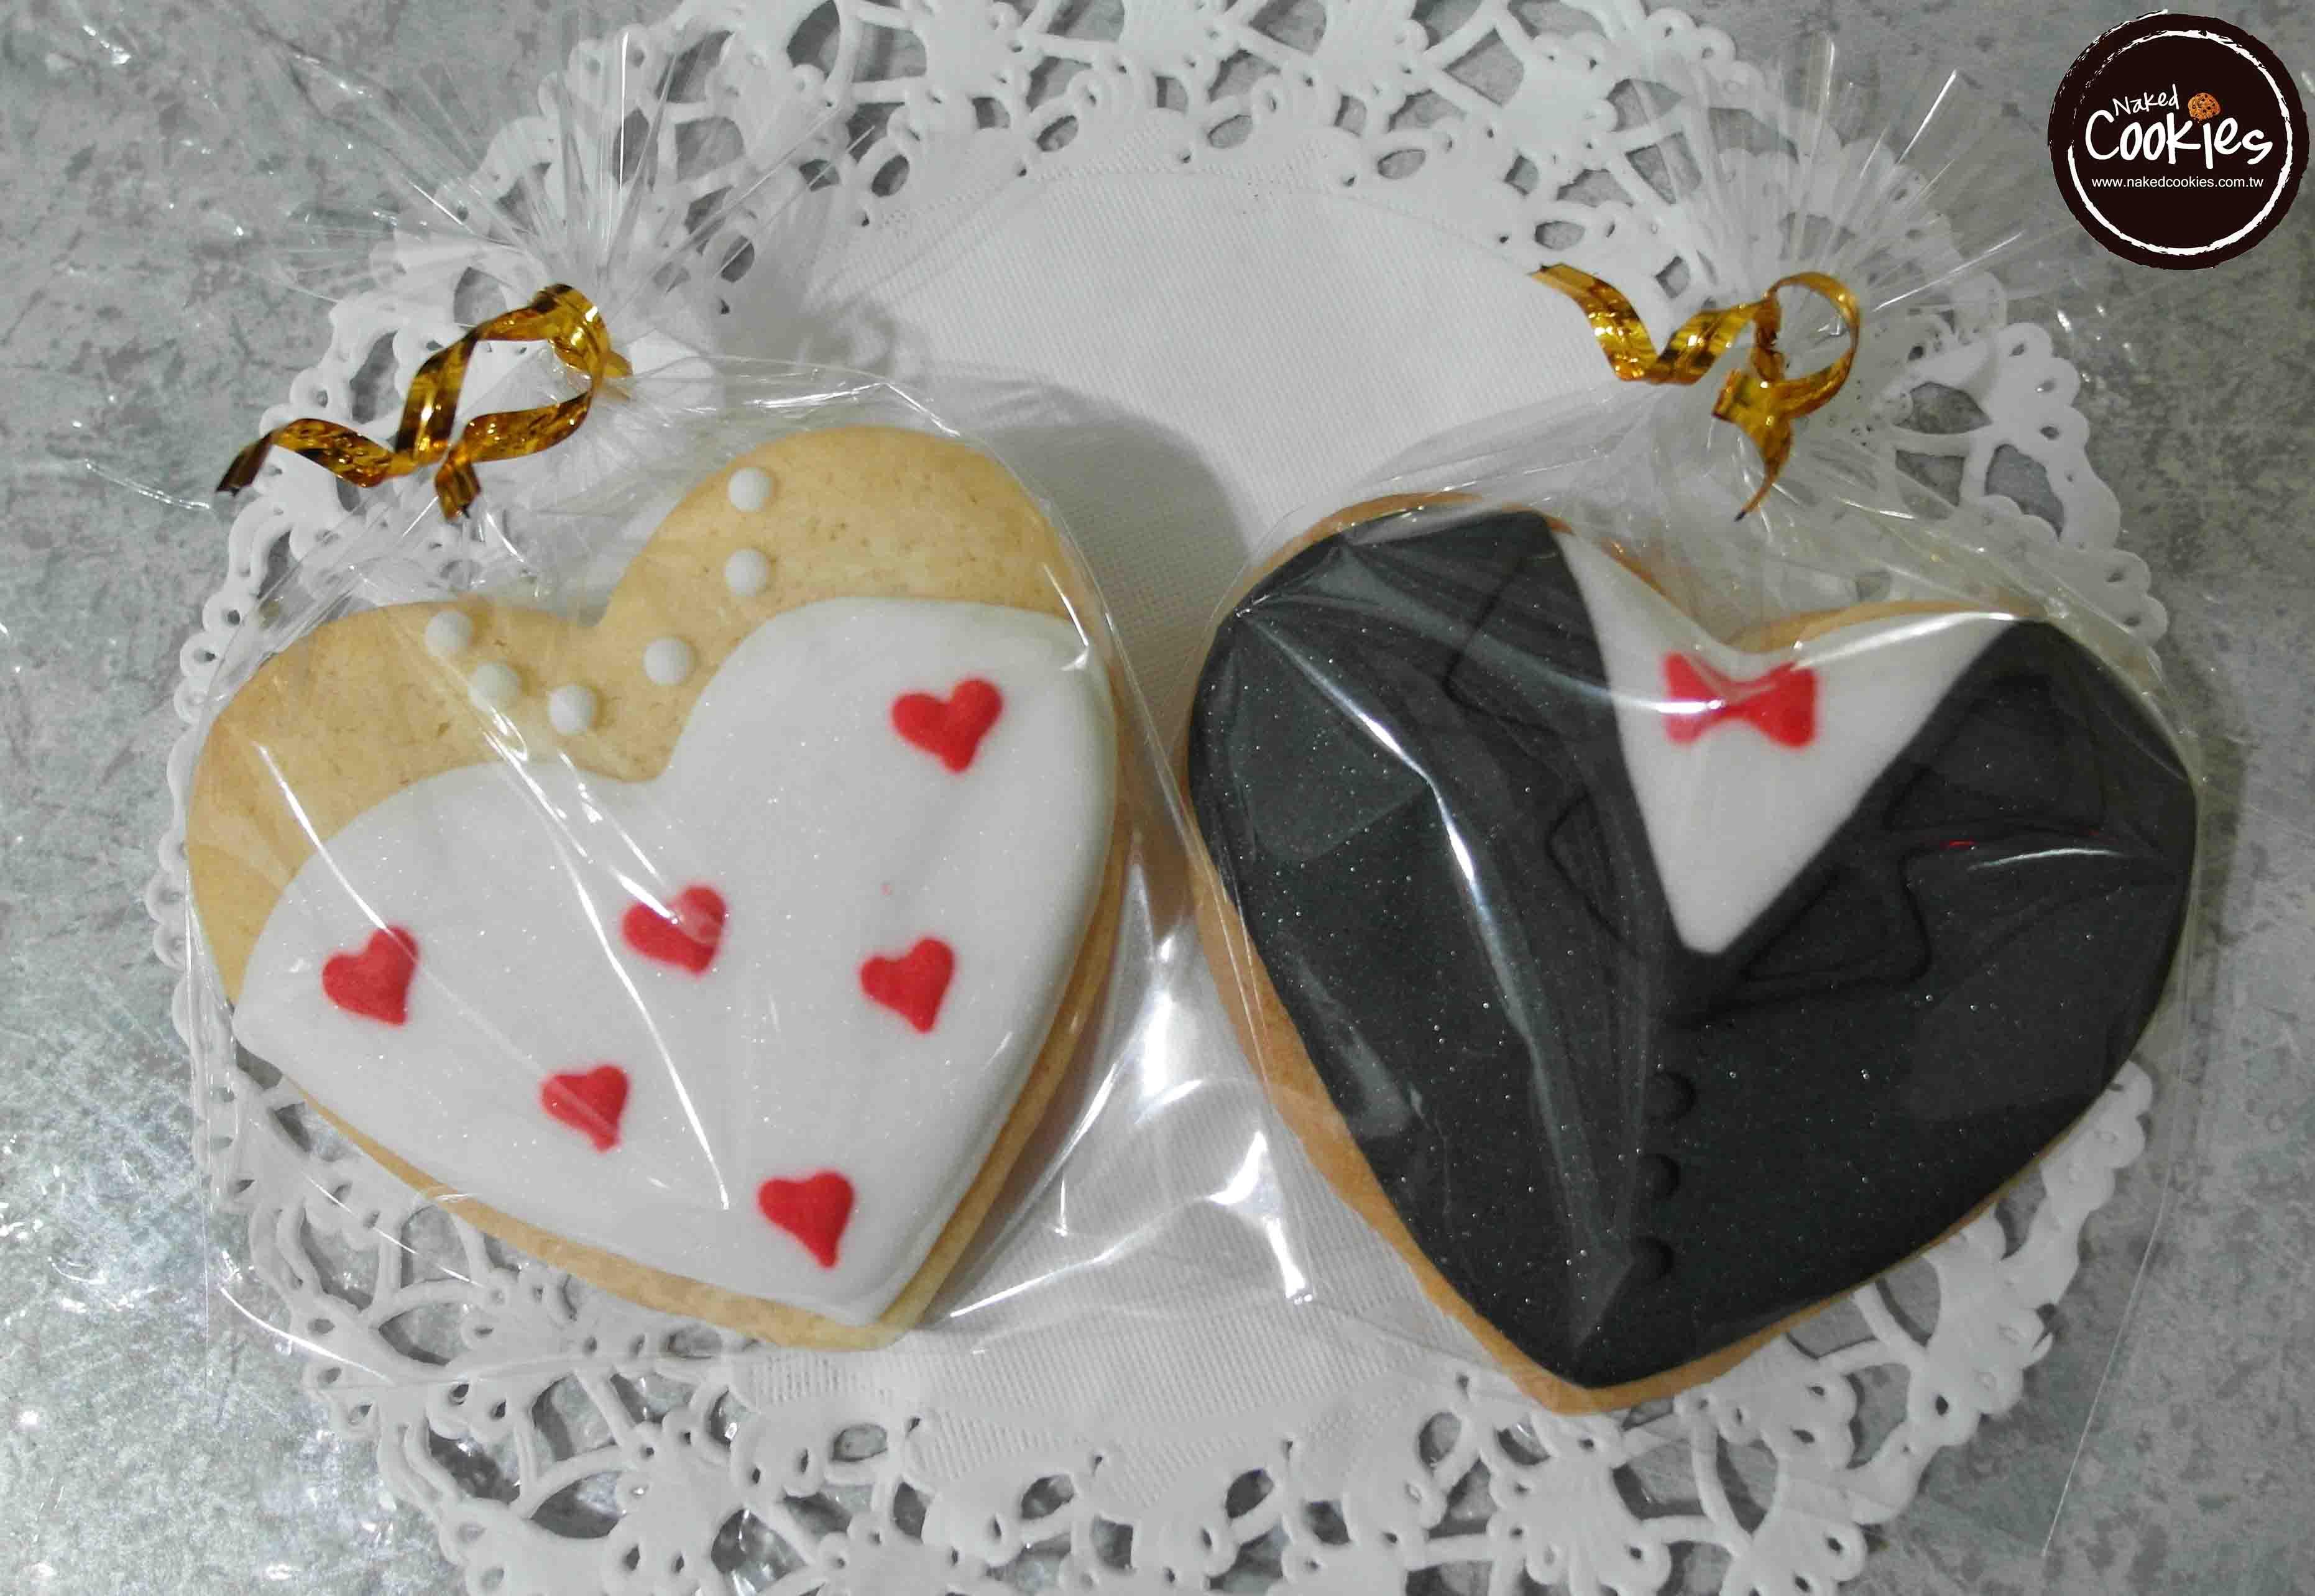 【Naked Cookies】婚禮婚紗西裝款6入-創意手工糖霜餅乾,婚禮/生日/活動/收涎/彌月